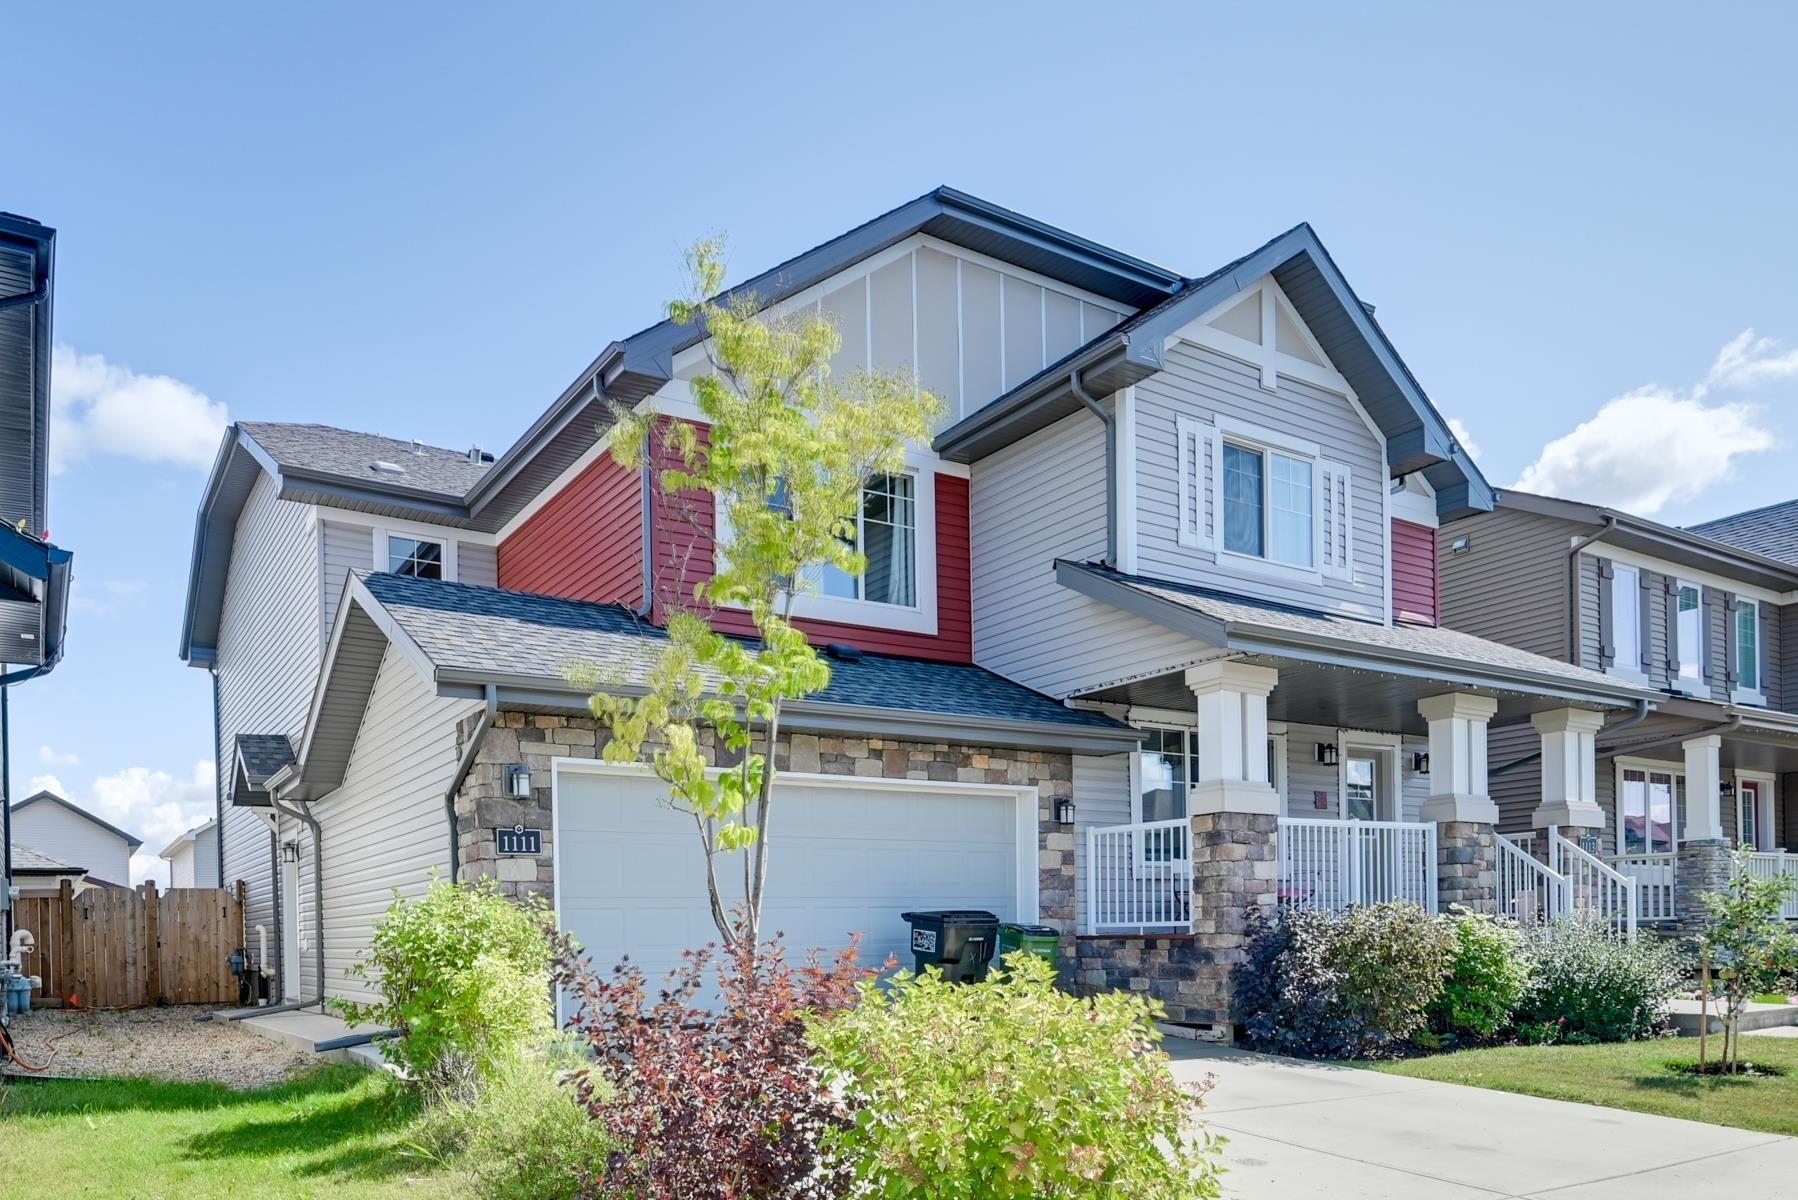 Main Photo: 1111 162 Street in Edmonton: Zone 56 House Half Duplex for sale : MLS®# E4260240